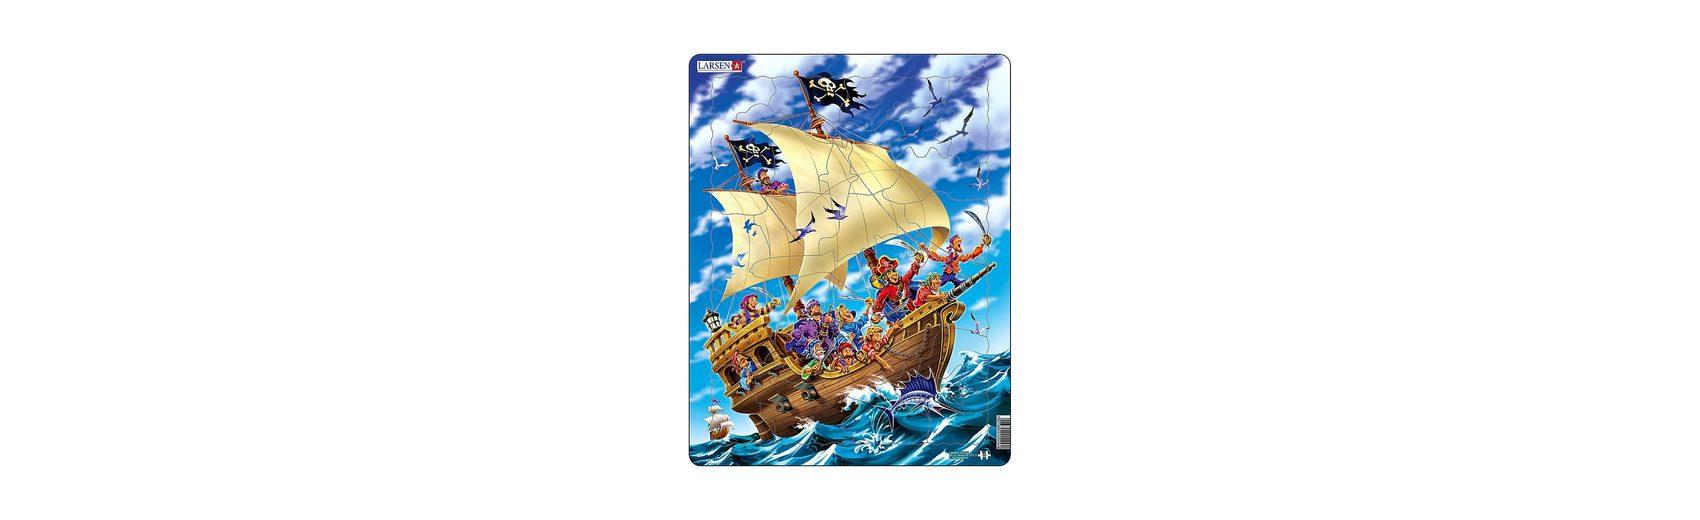 Larsen Rahmenpuzzle 30 Teile Piraten